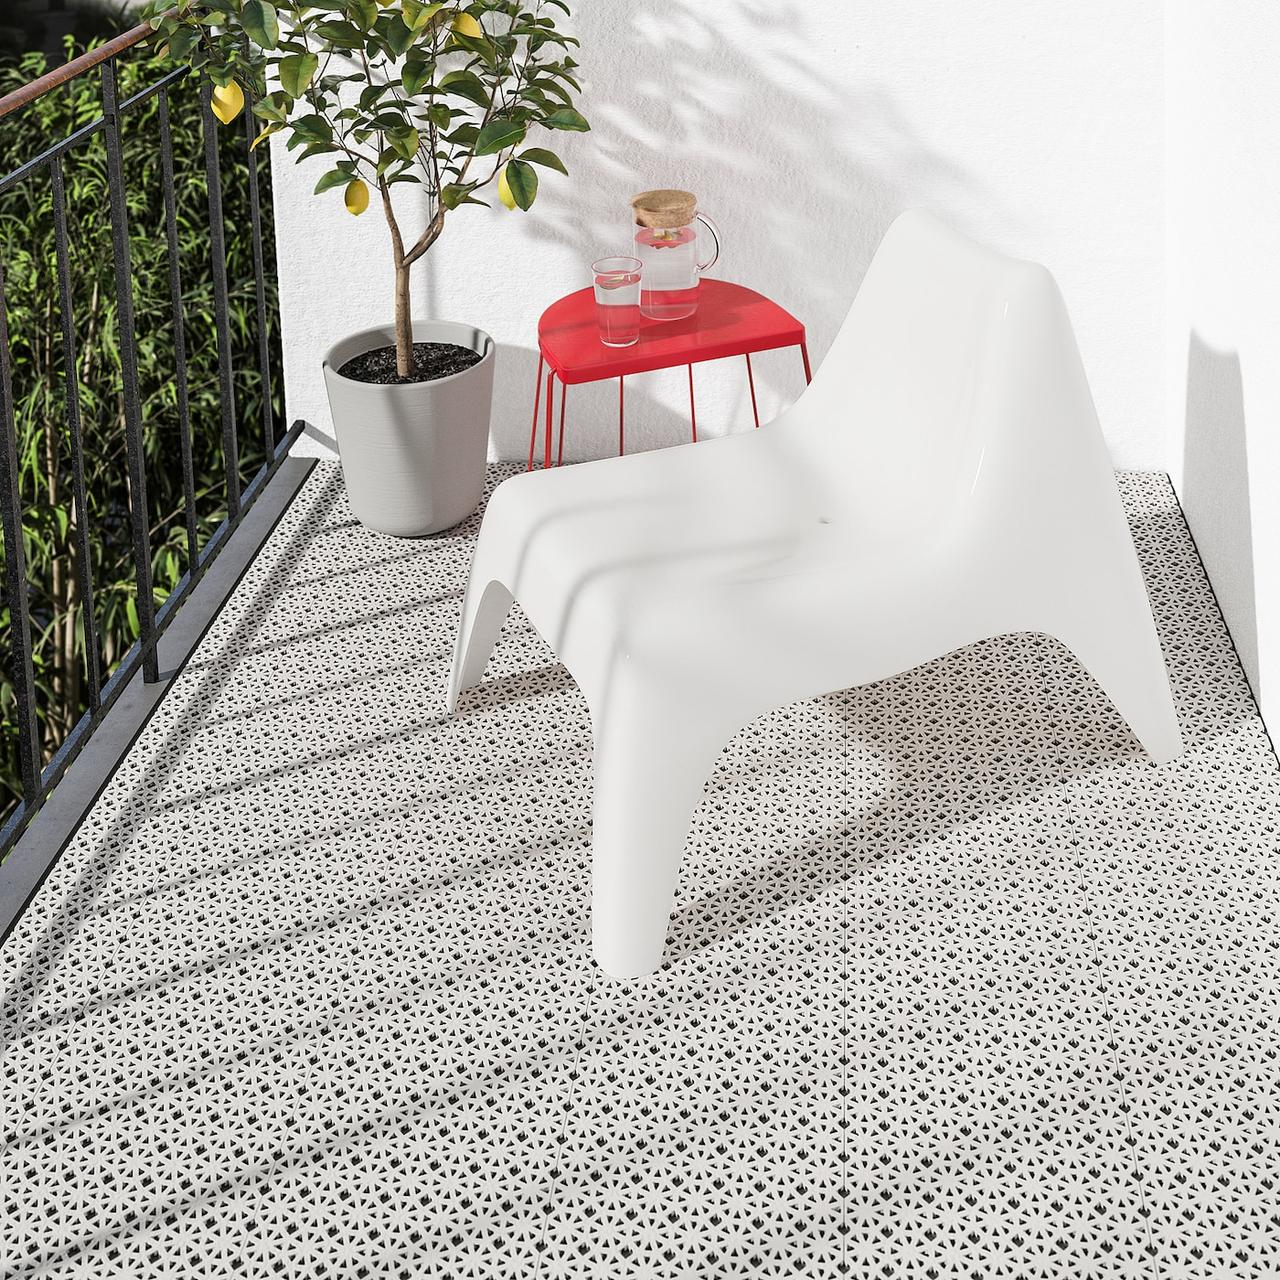 IKEA ALTAPPEN Плита-покрытие, садовая 904.208.98